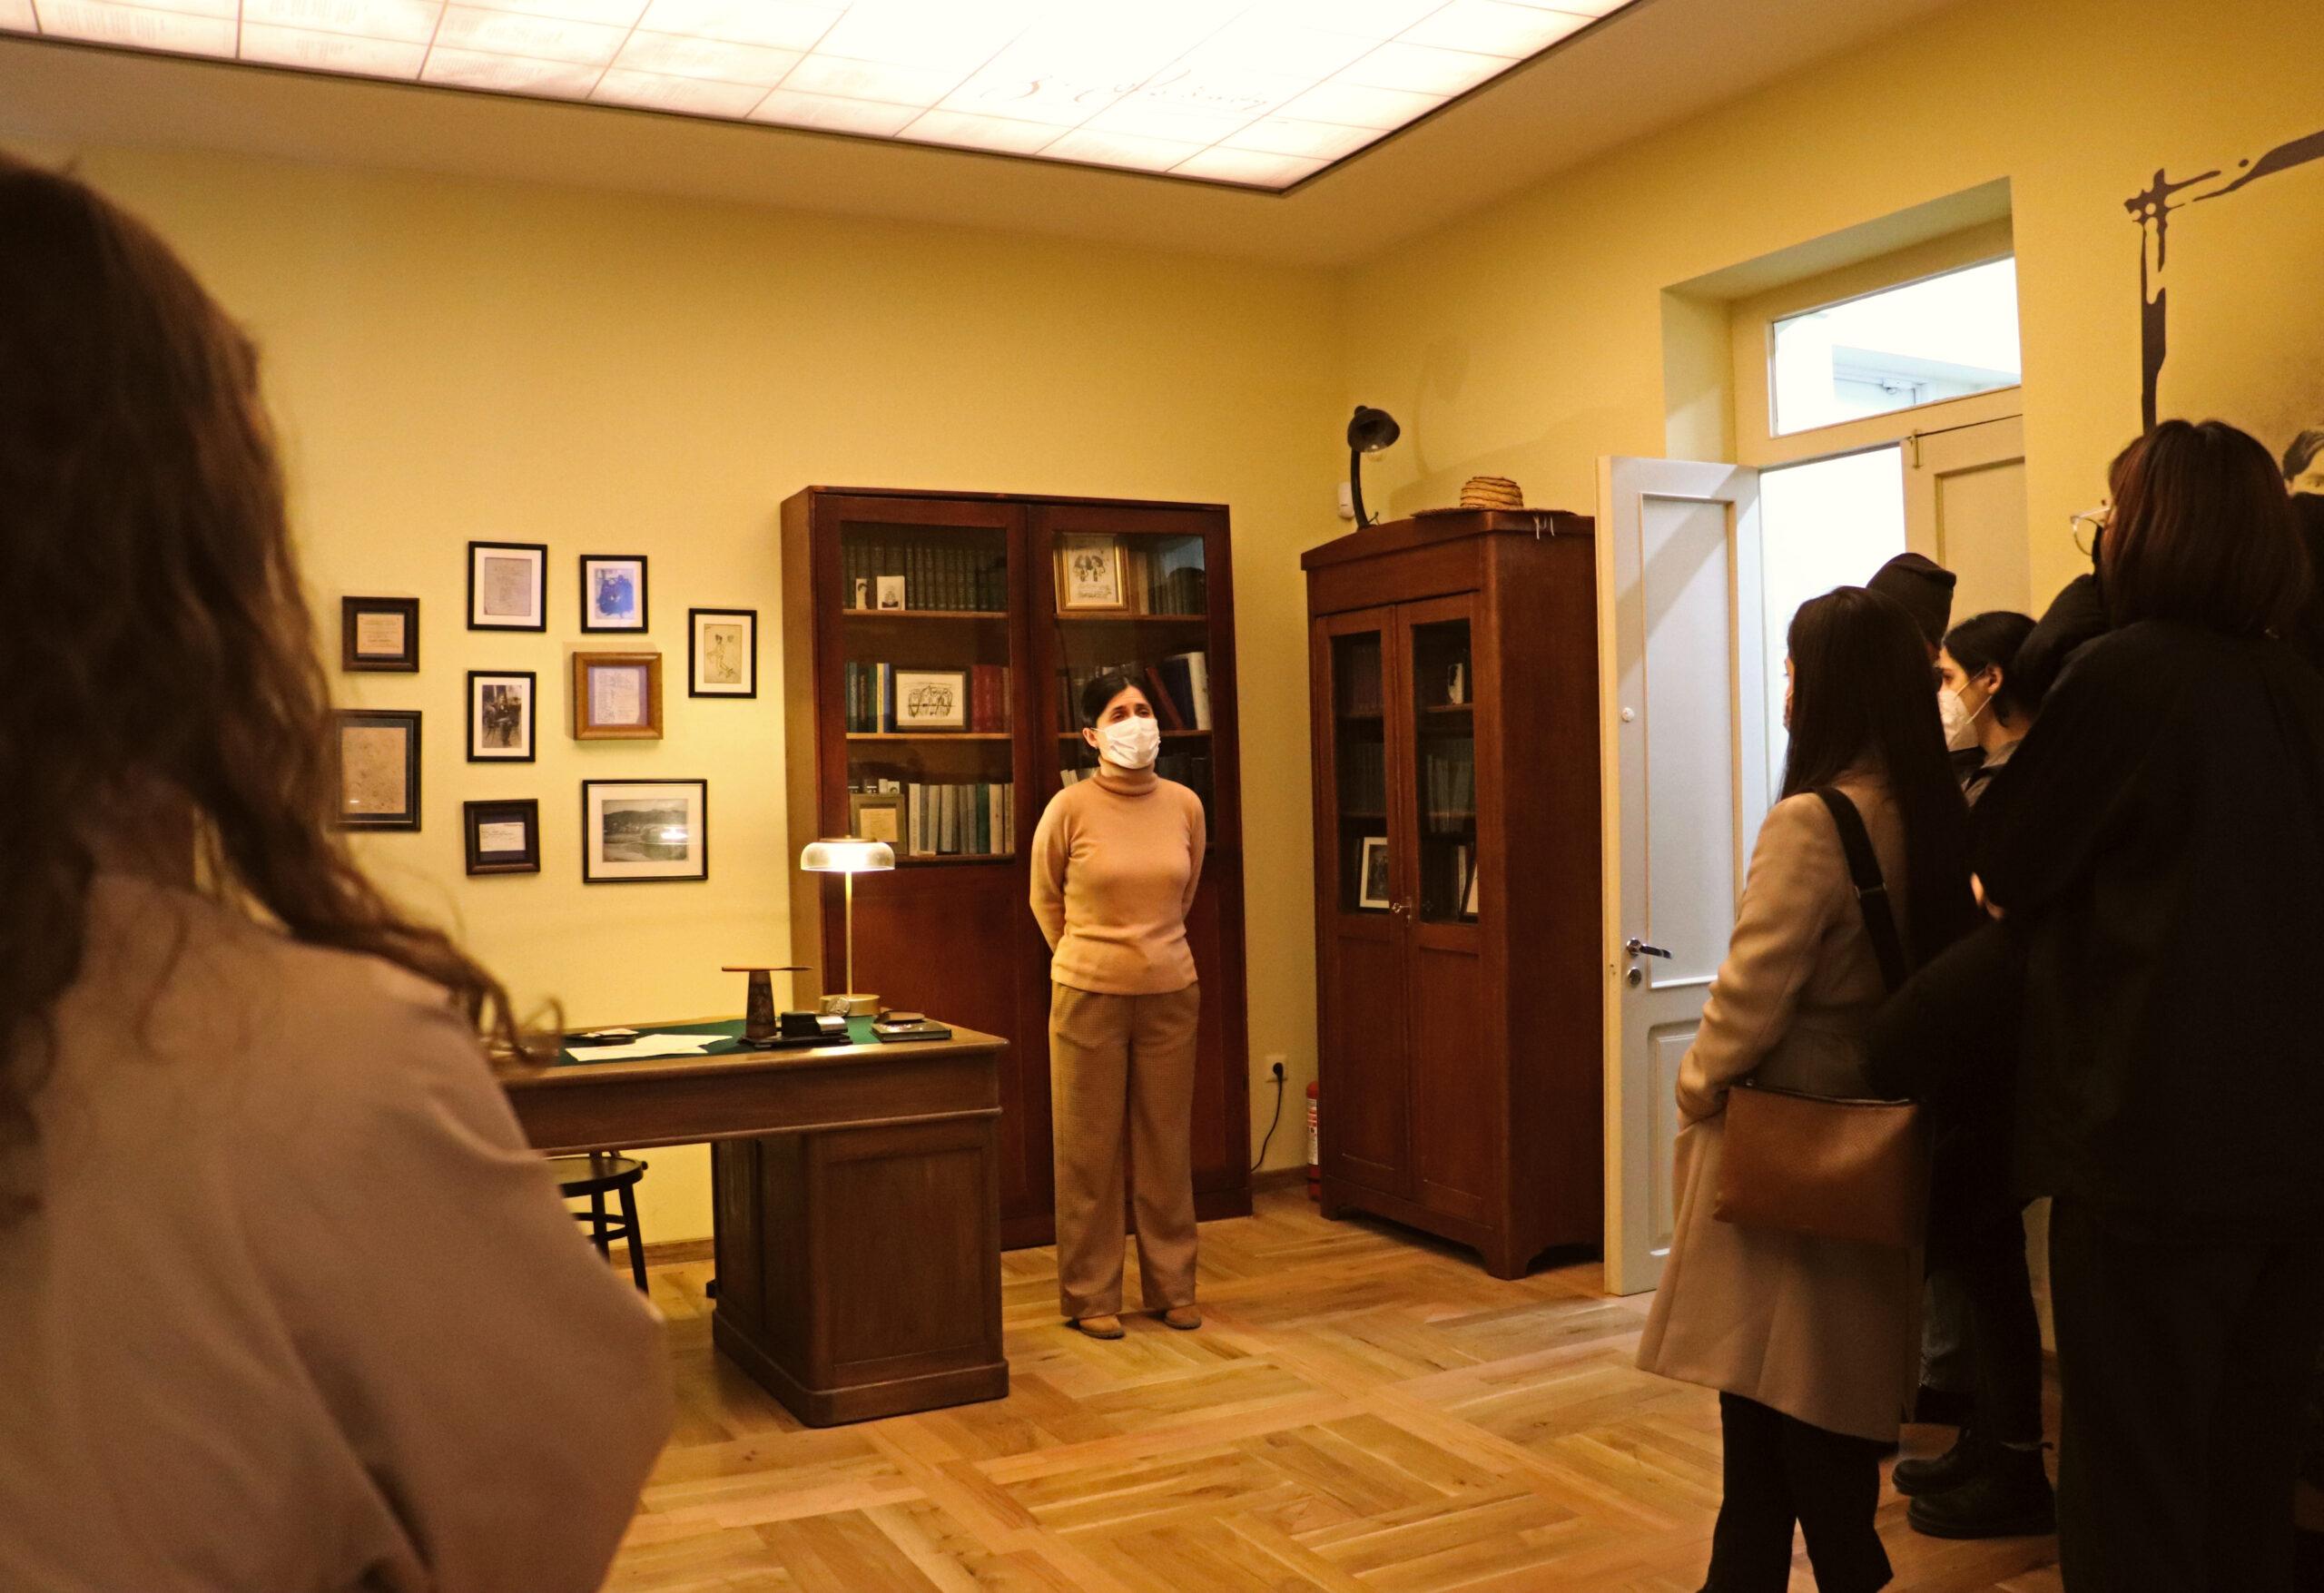 IMG 9348 scaled - სტუმრად გალაკტიონ ტაბიძის მემორიალურ ბინა-მუზეუმში